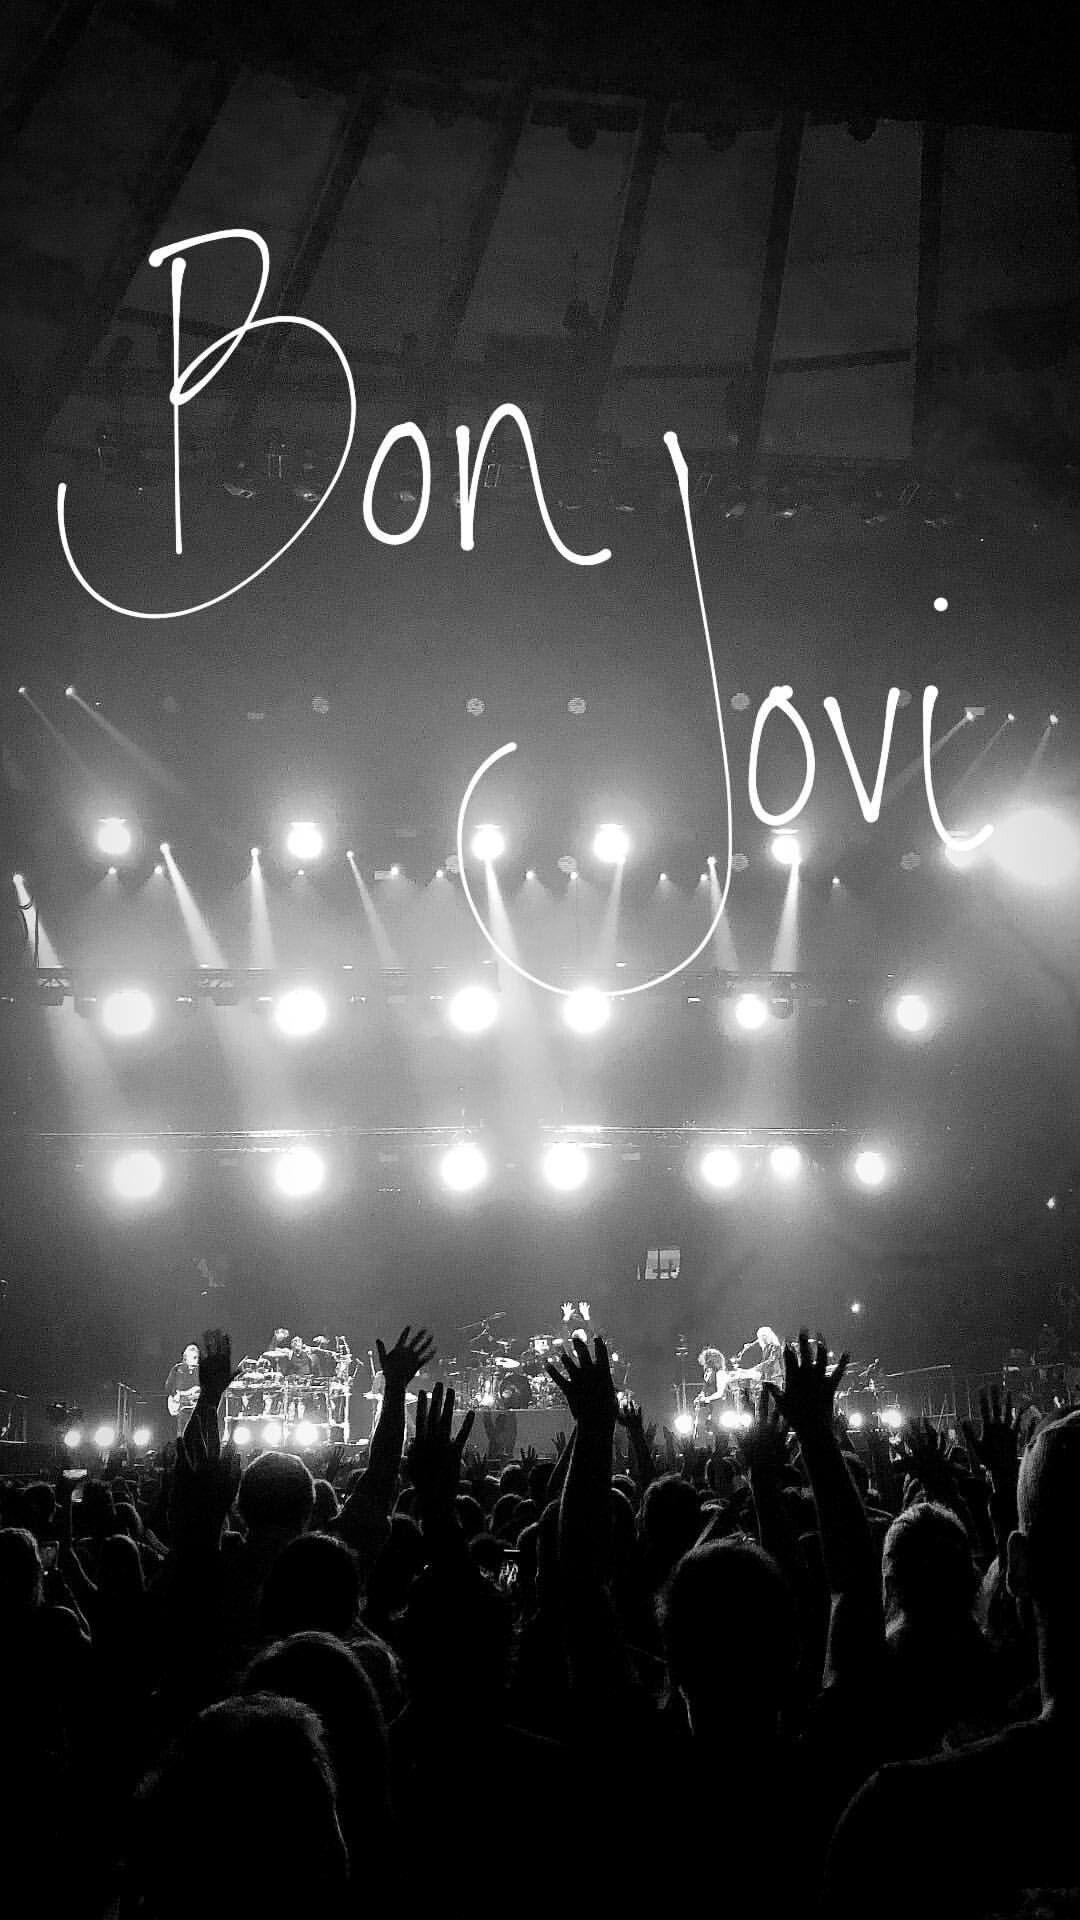 Bon Jovi Bon Jovi Bon Jovi 80s Bon Jovi Concert